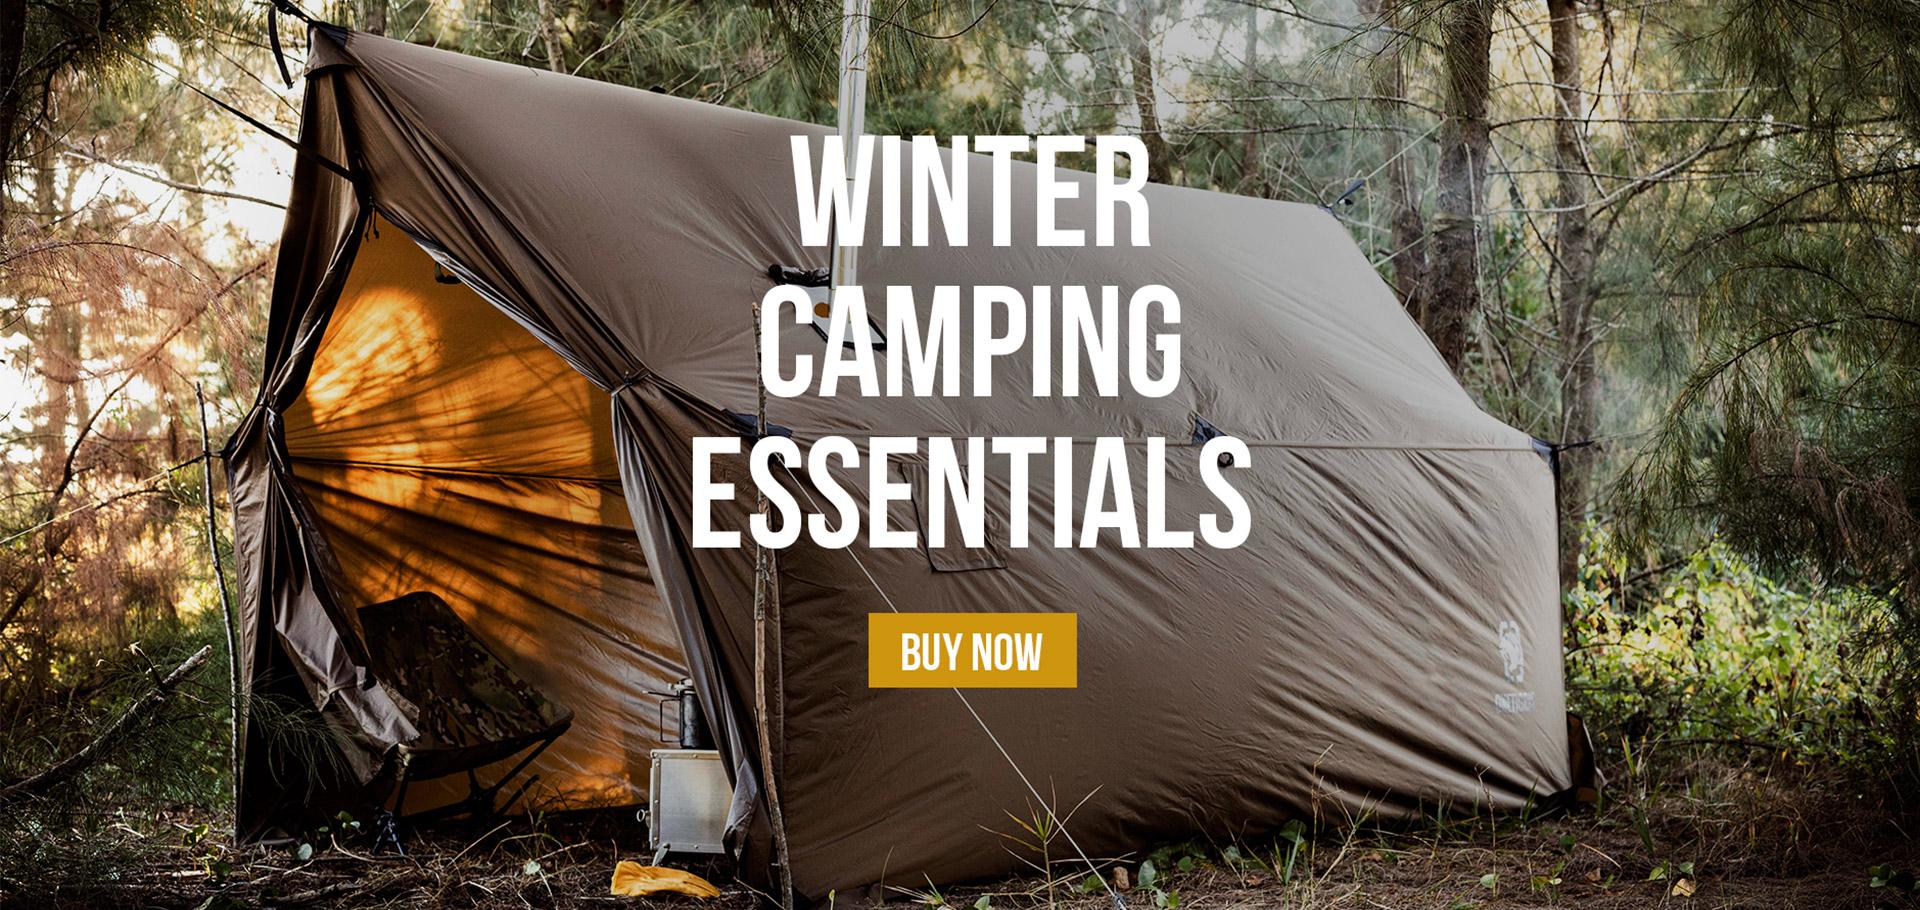 Winter Camping Essentials